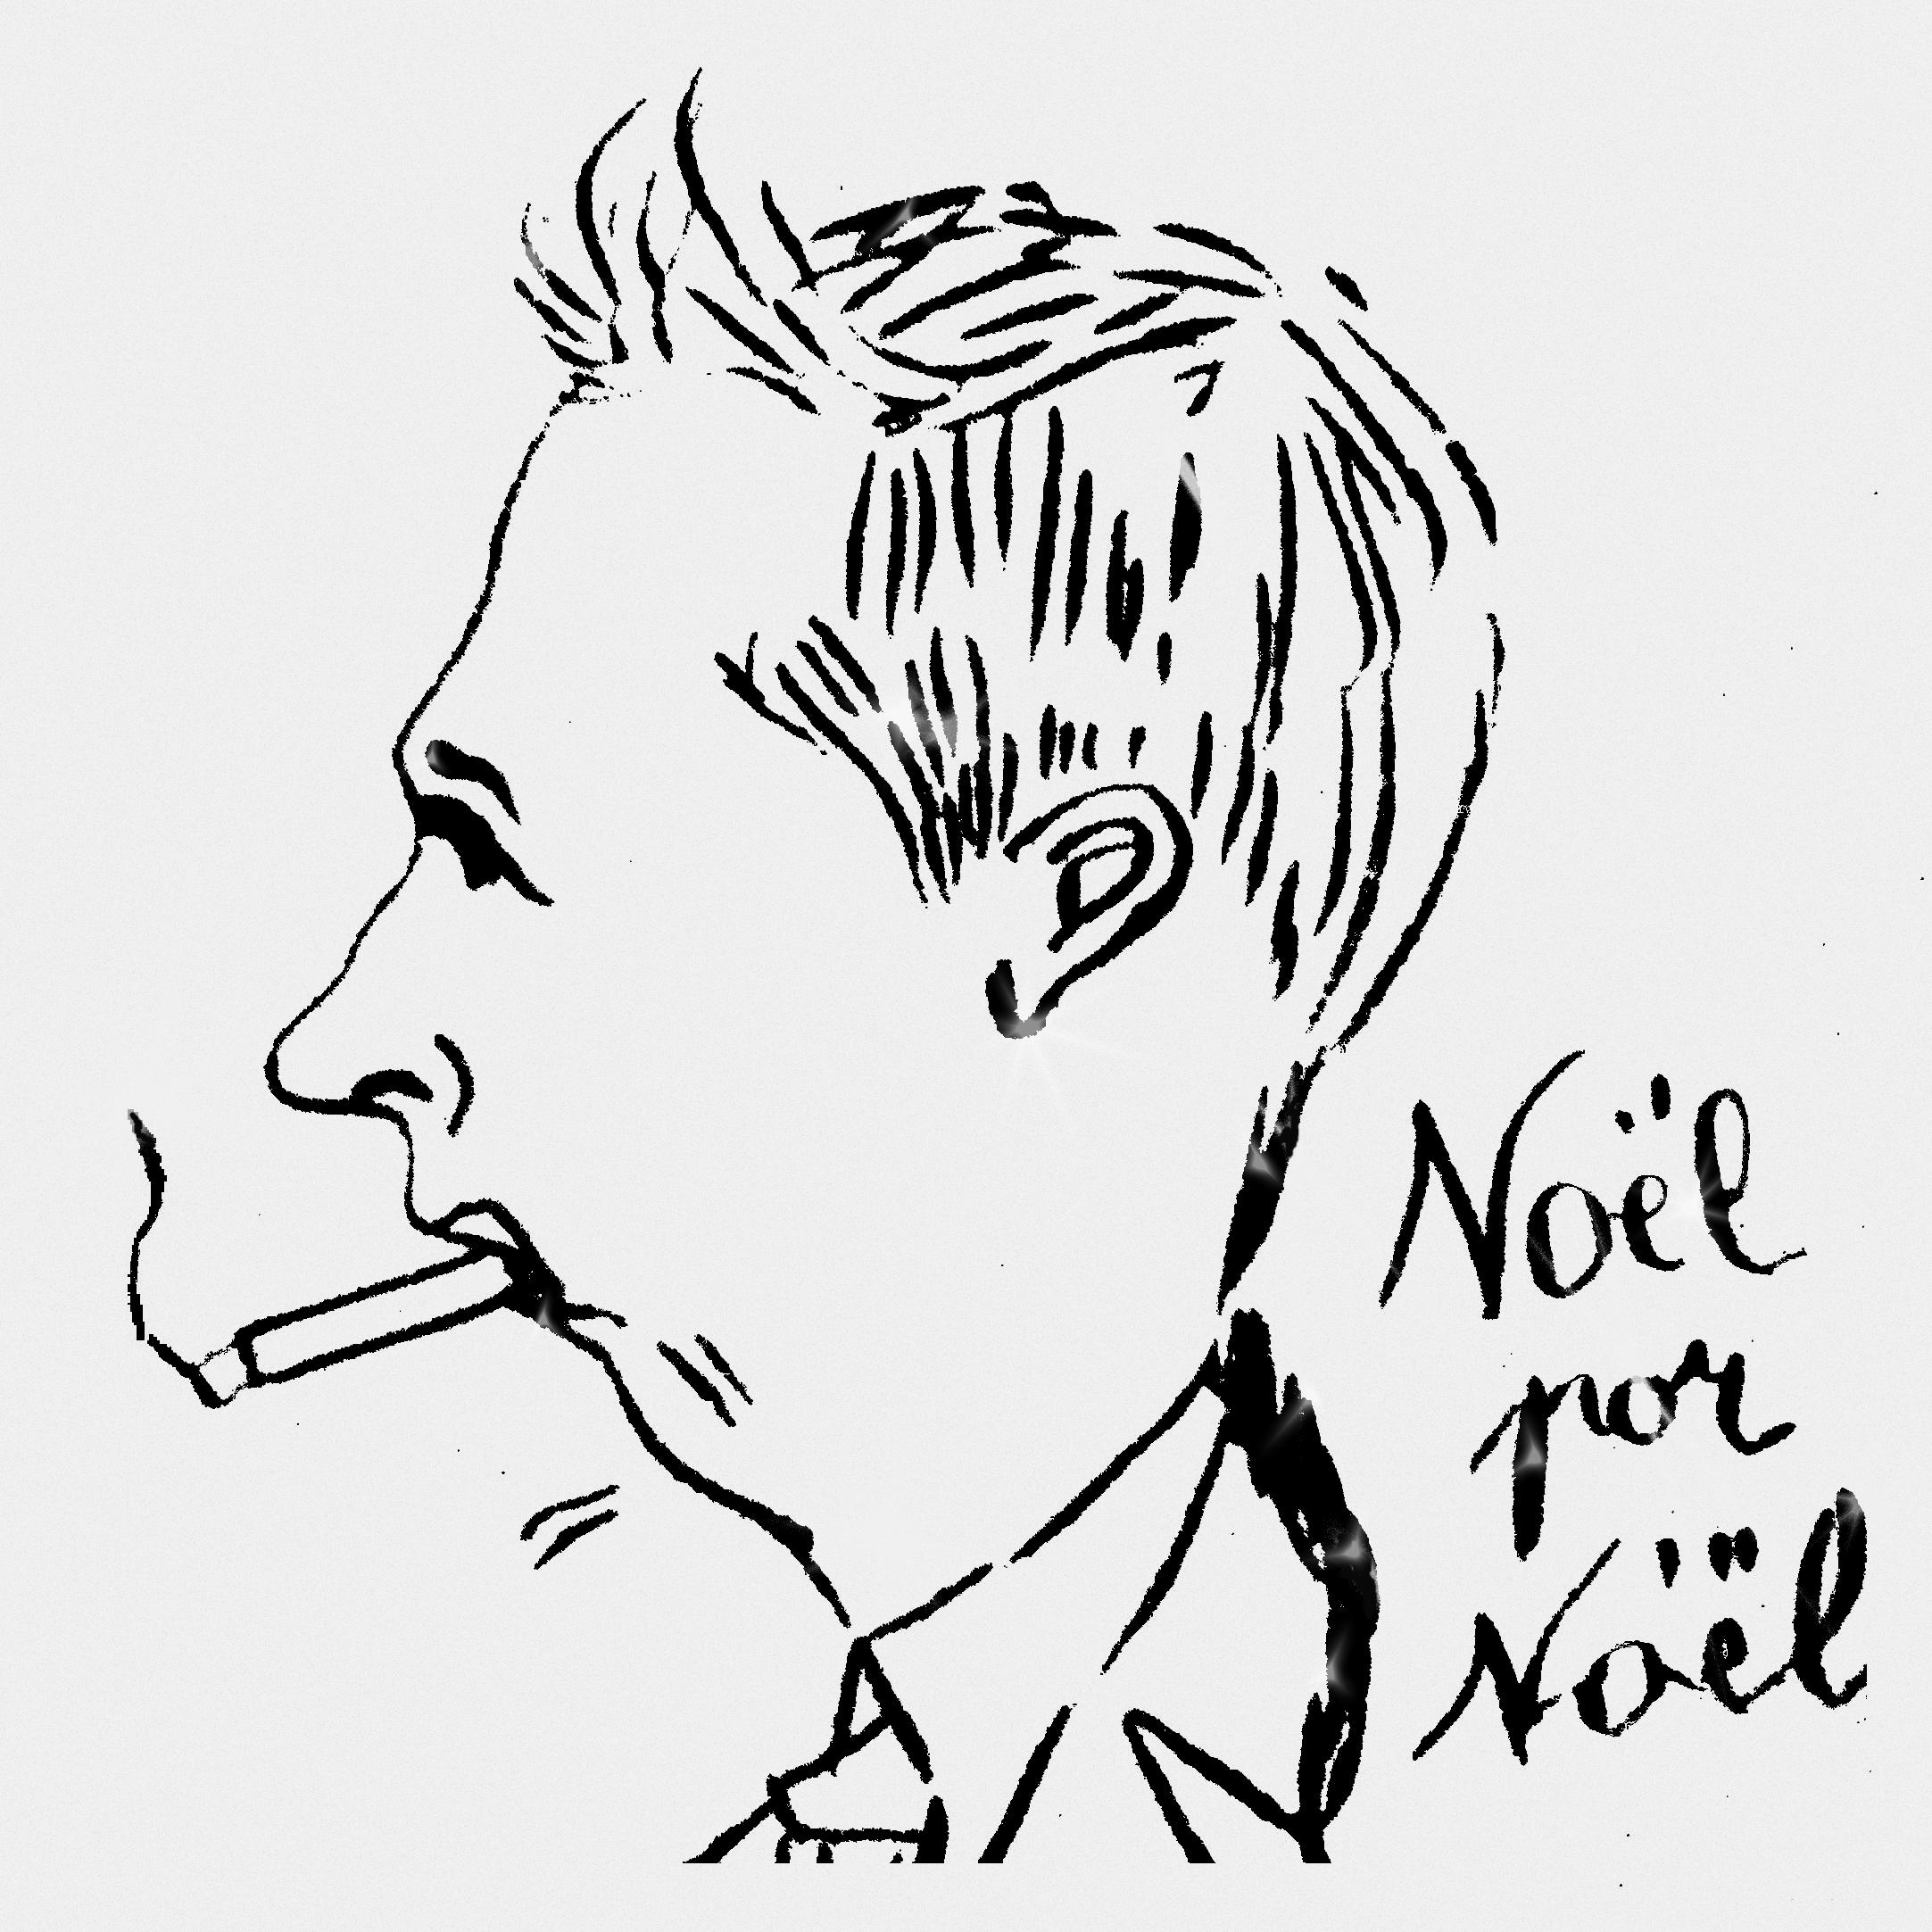 Resultado de imagem para noel rosa caricatura